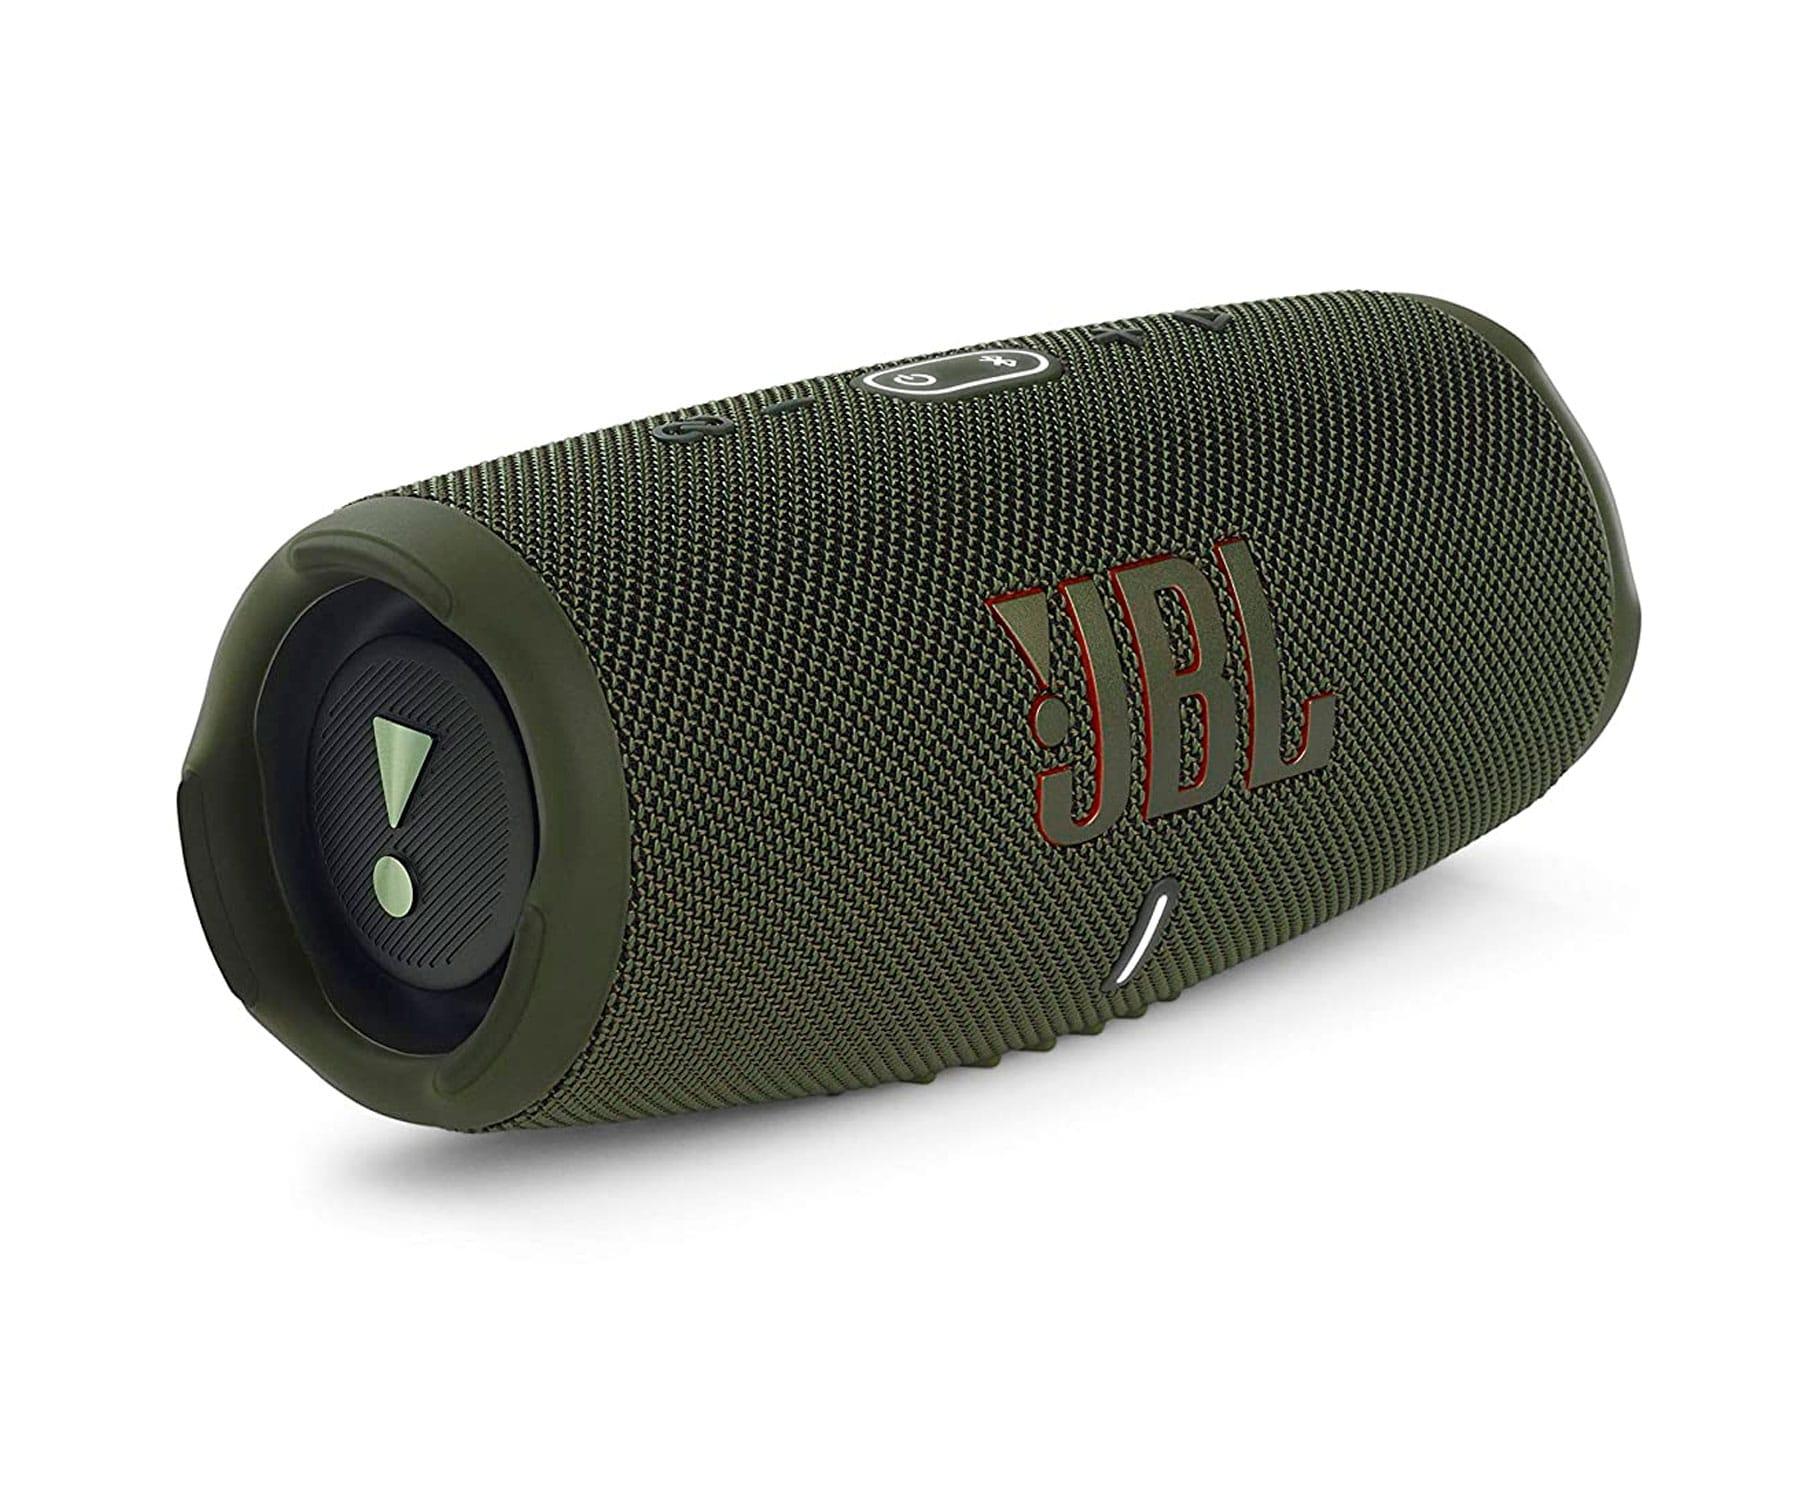 Jbl Altavoz Charge5 Verde/Bluetooth/IP67/Partyboost